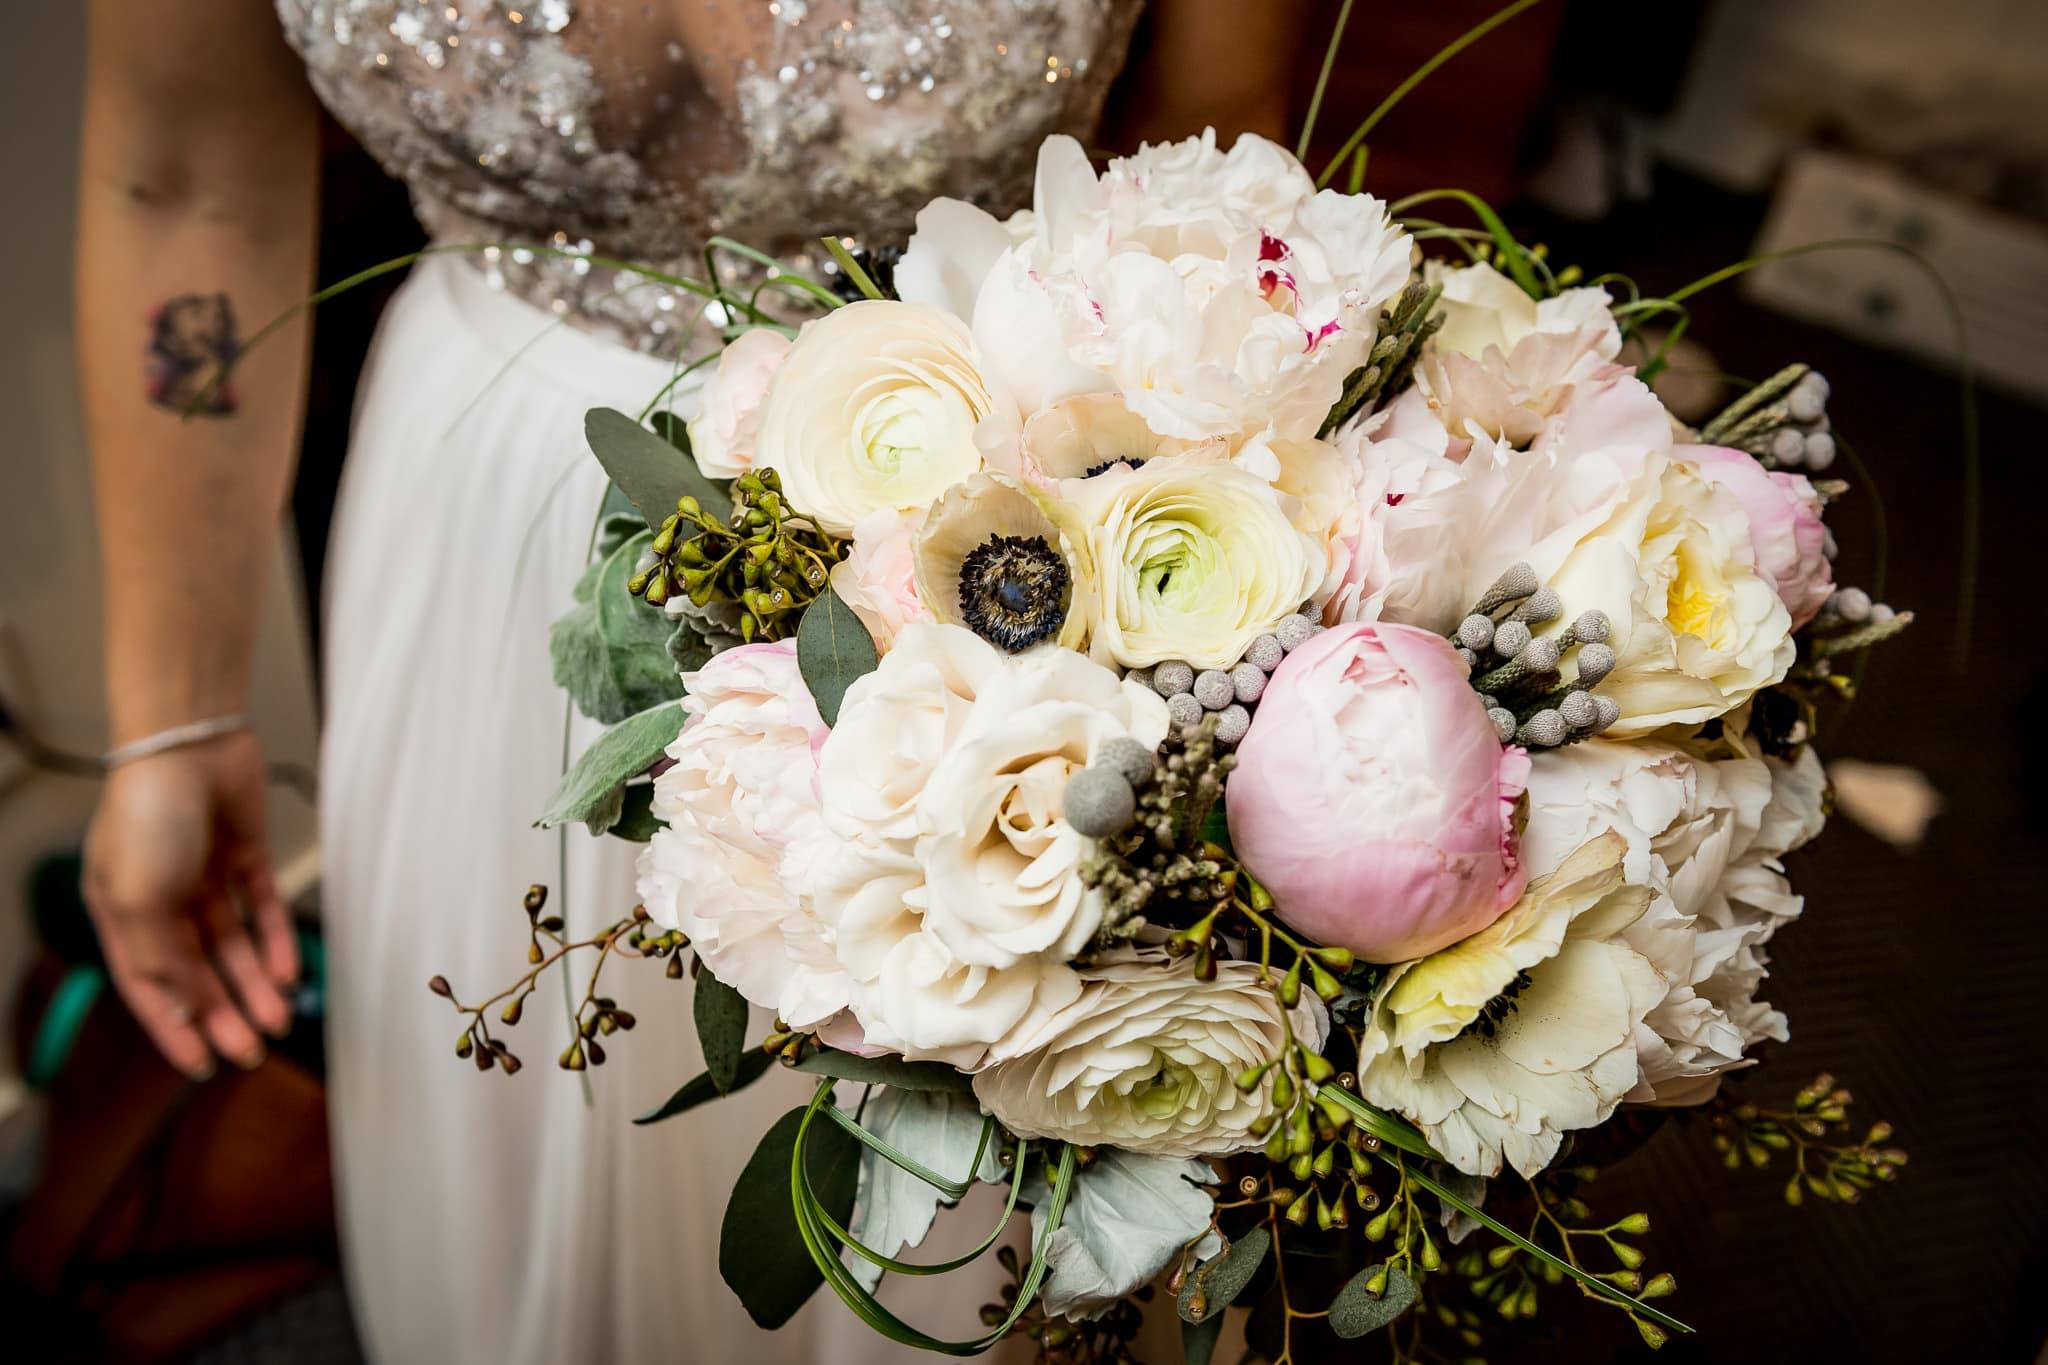 Brides bouquet of flowers by Artemisia Studios